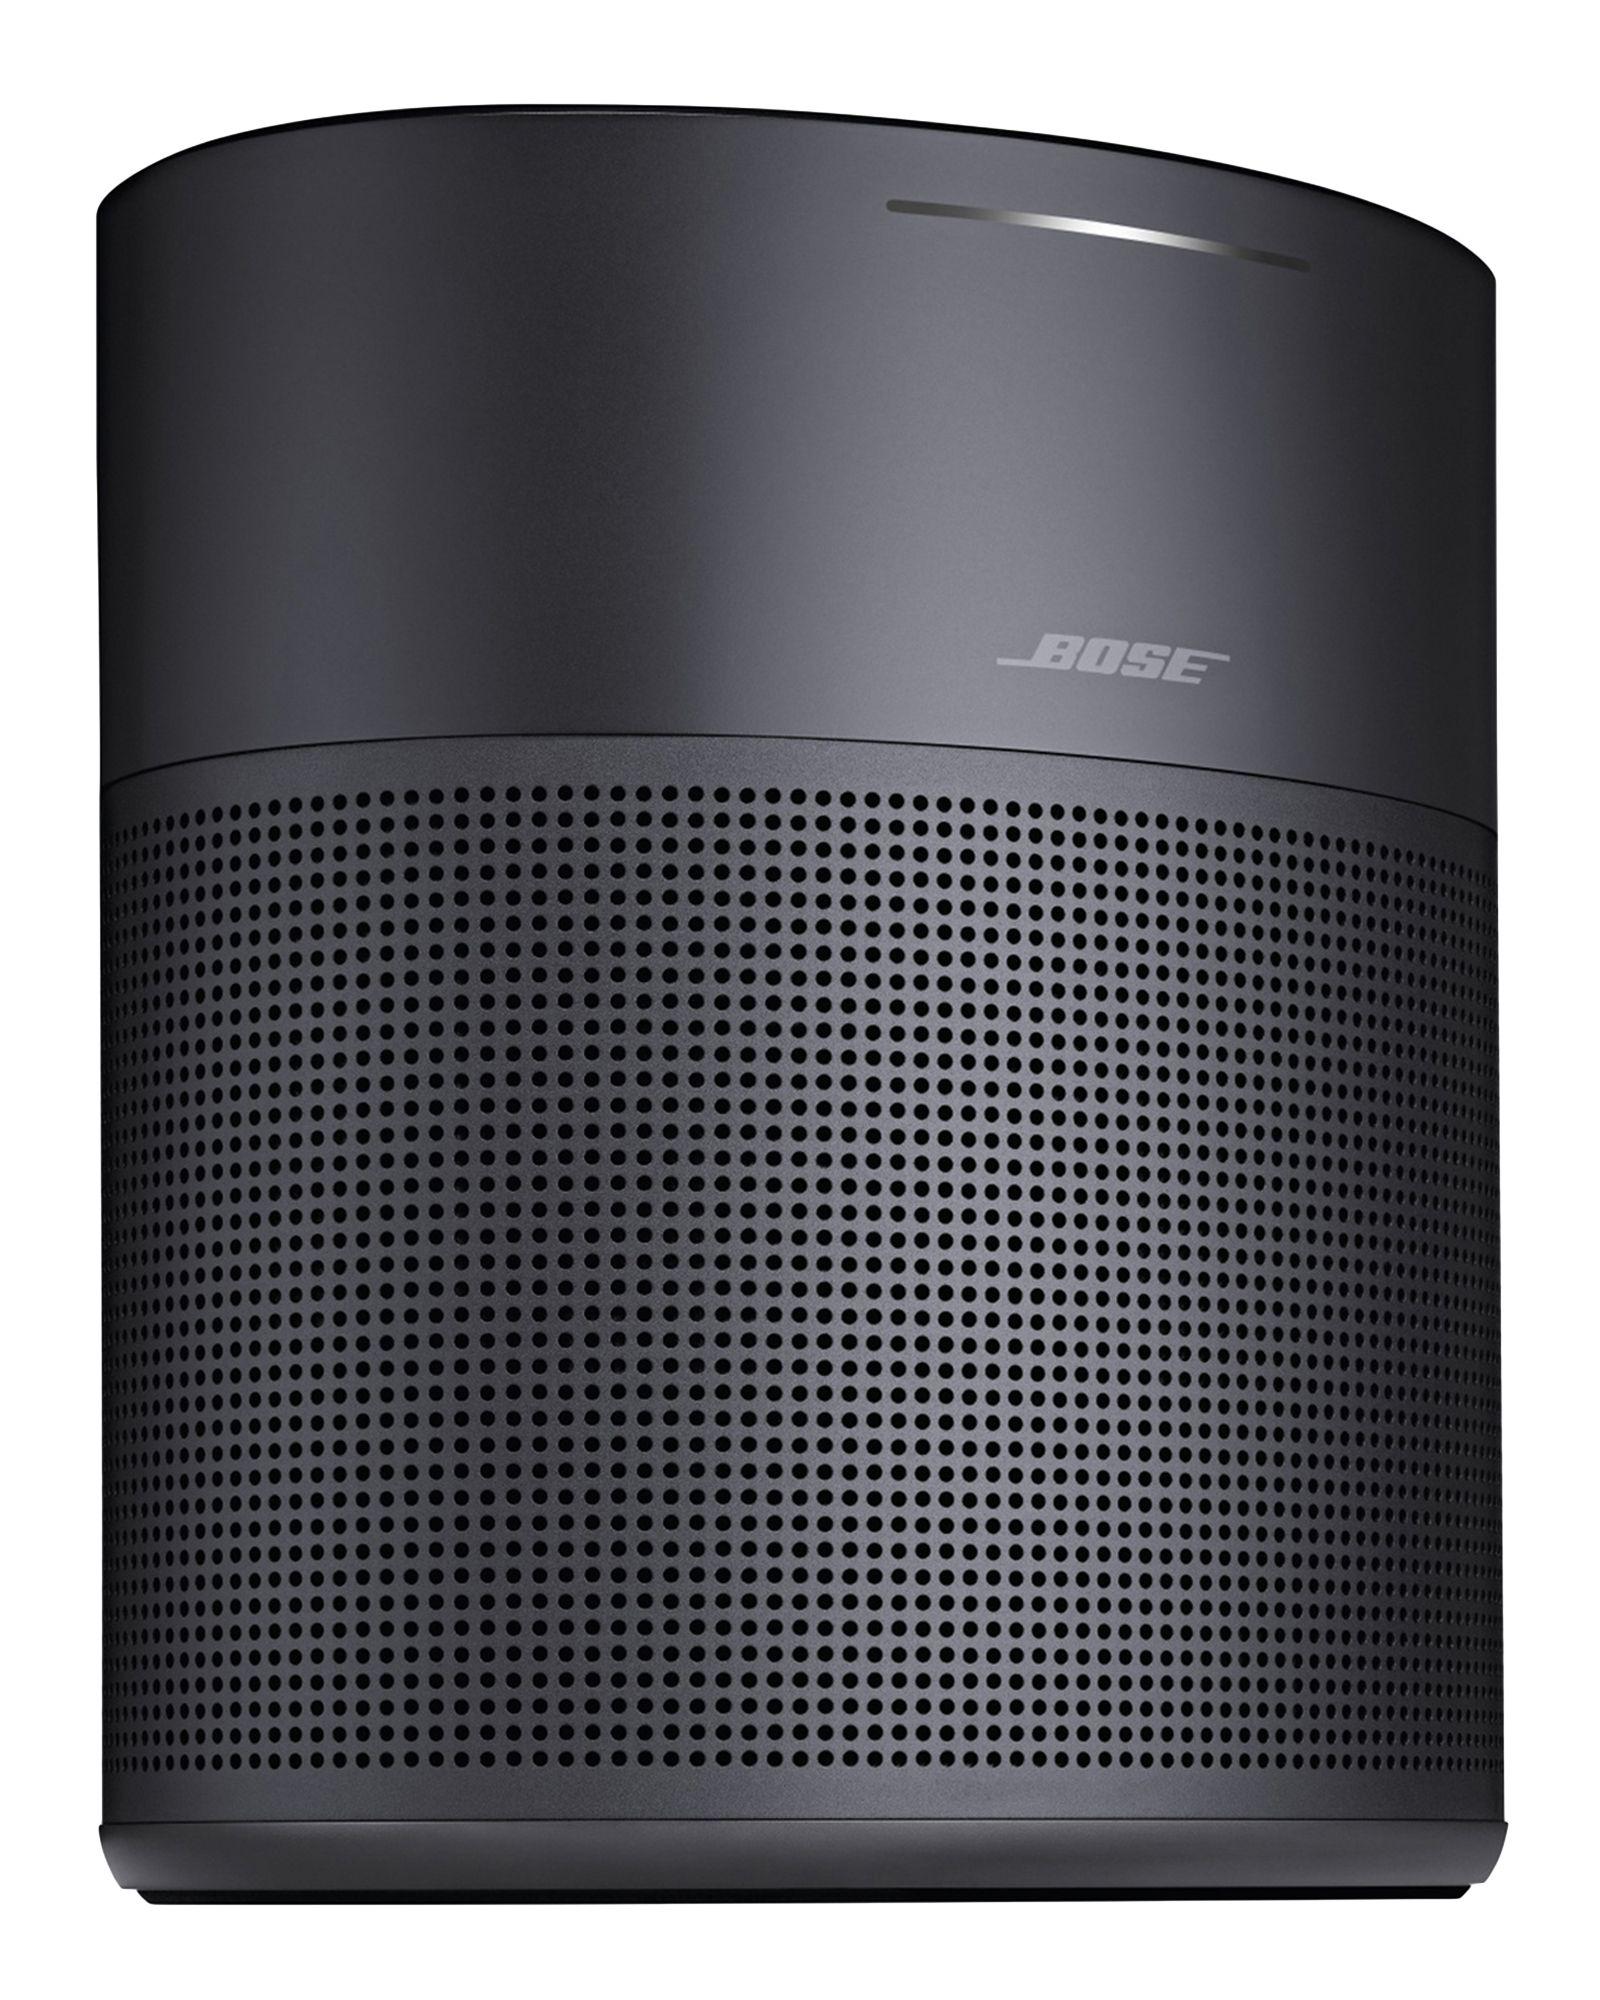 Black Home Speaker 300 In 2020 Home Speakers Black House